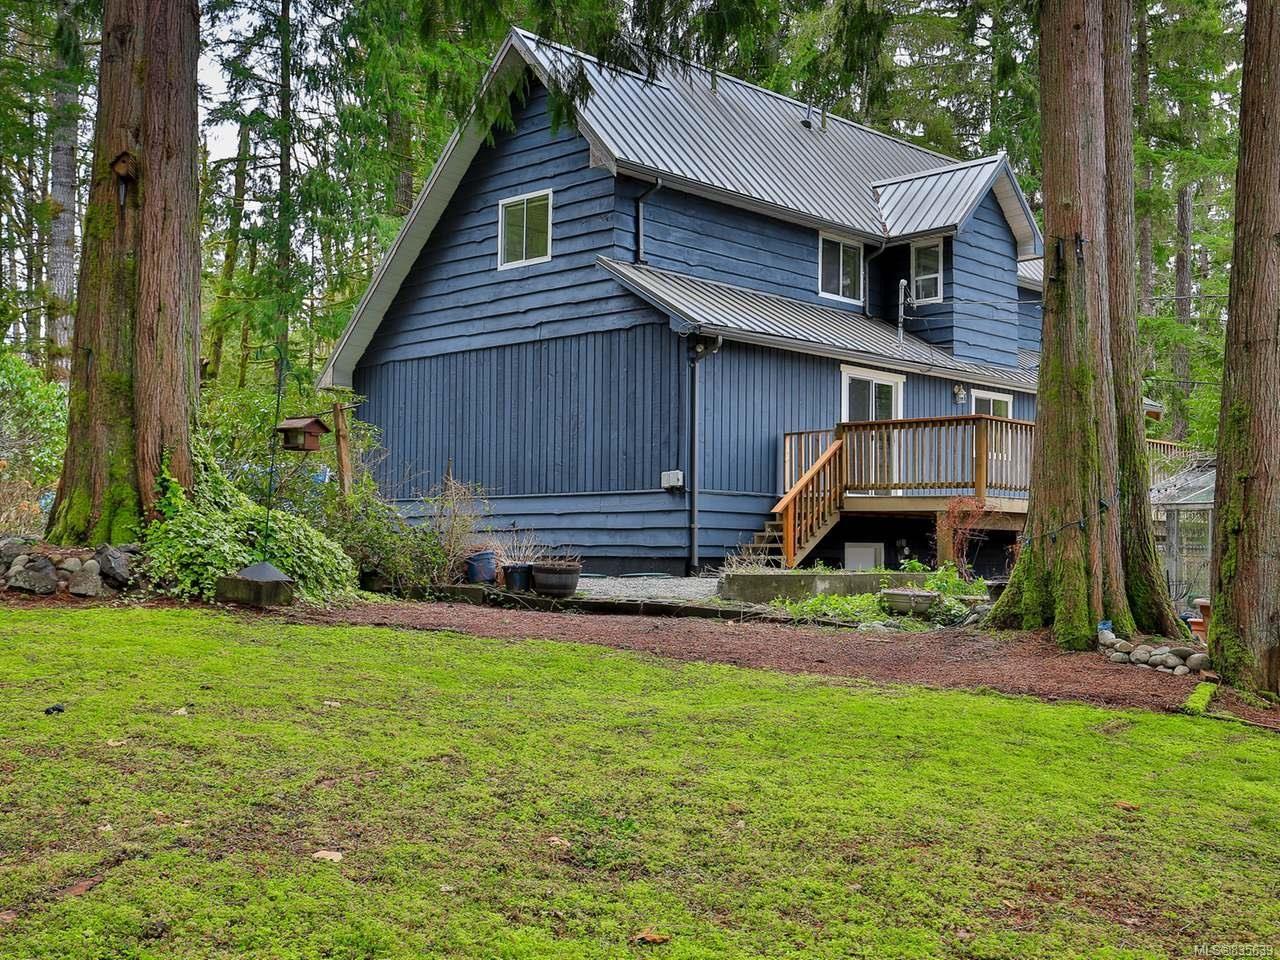 Photo 49: Photos: 9657 Faber Rd in PORT ALBERNI: PA Sproat Lake House for sale (Port Alberni)  : MLS®# 835639